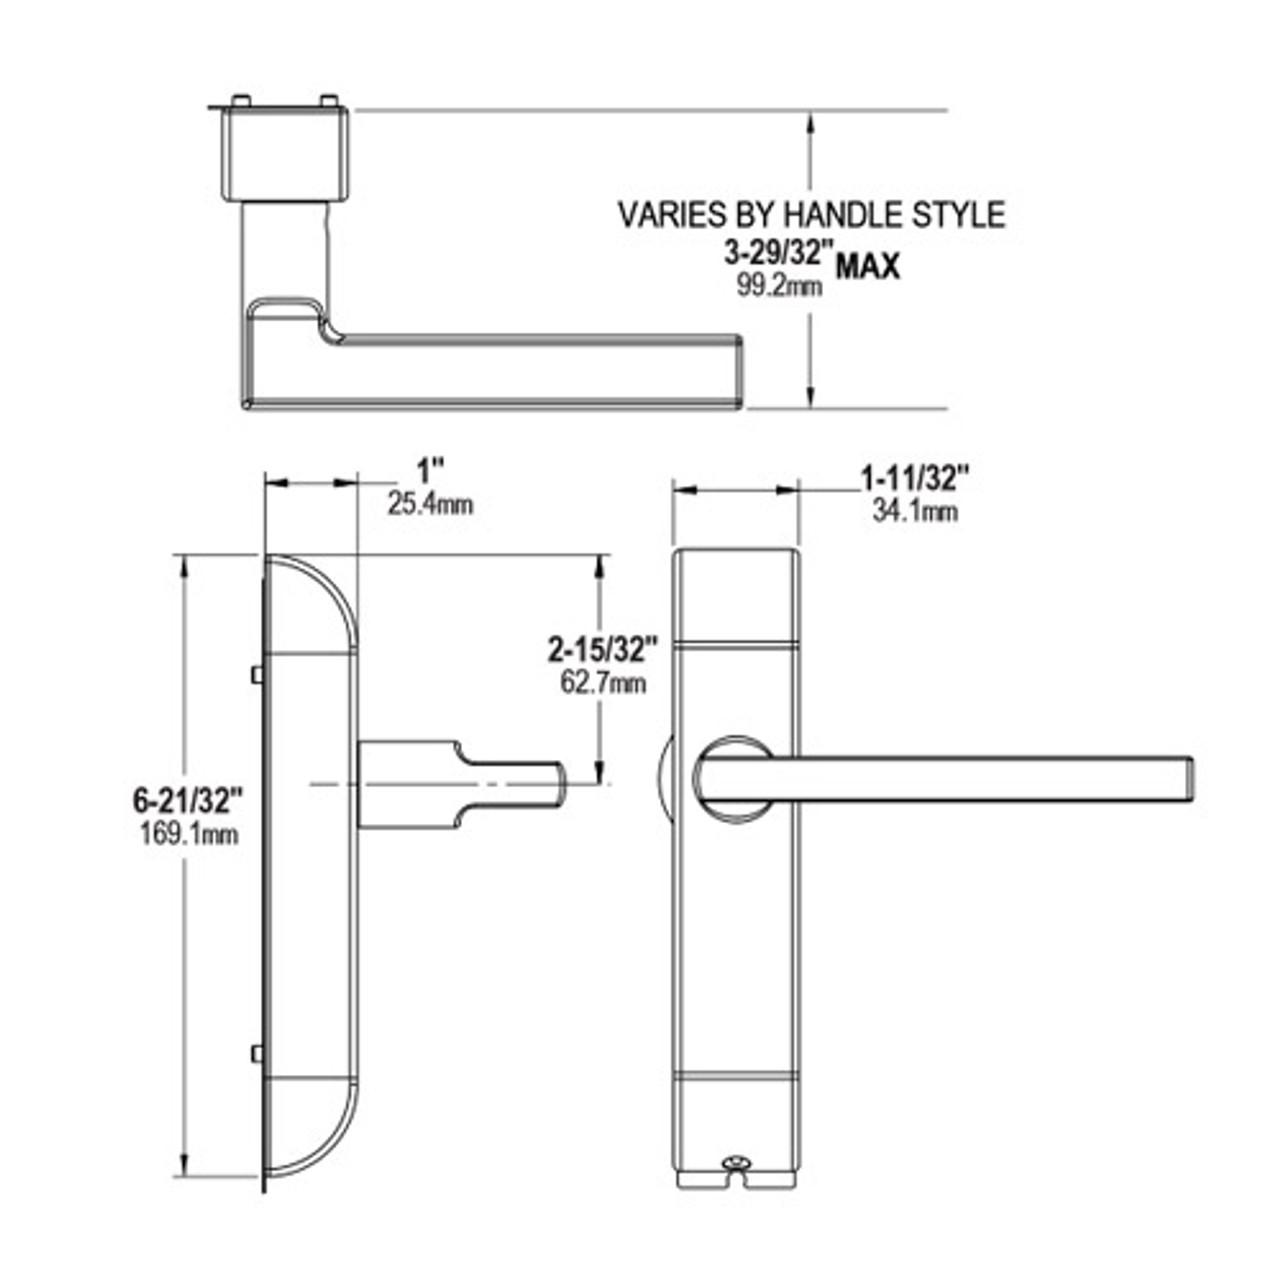 4600-MW-632-US32 Adams Rite MW Designer handle Dimensional View